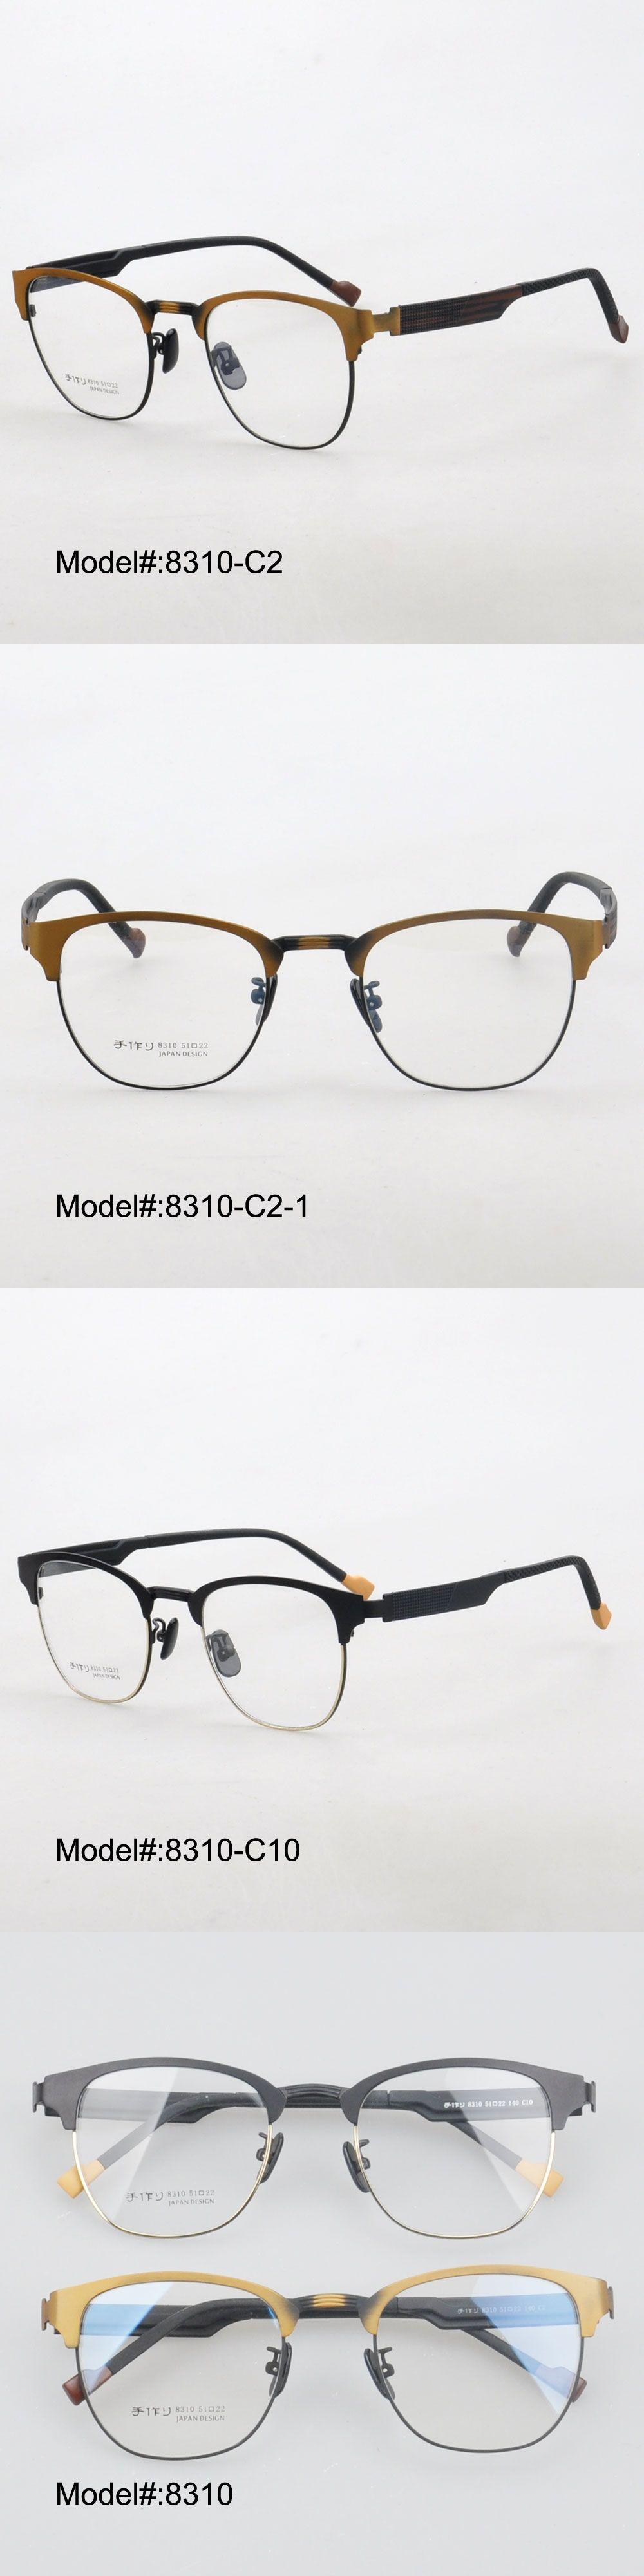 0526bdf89e0 MY DOLI New 8310 full rim men style stainless steel RX optical frames  myopia eyewear eyeglasses